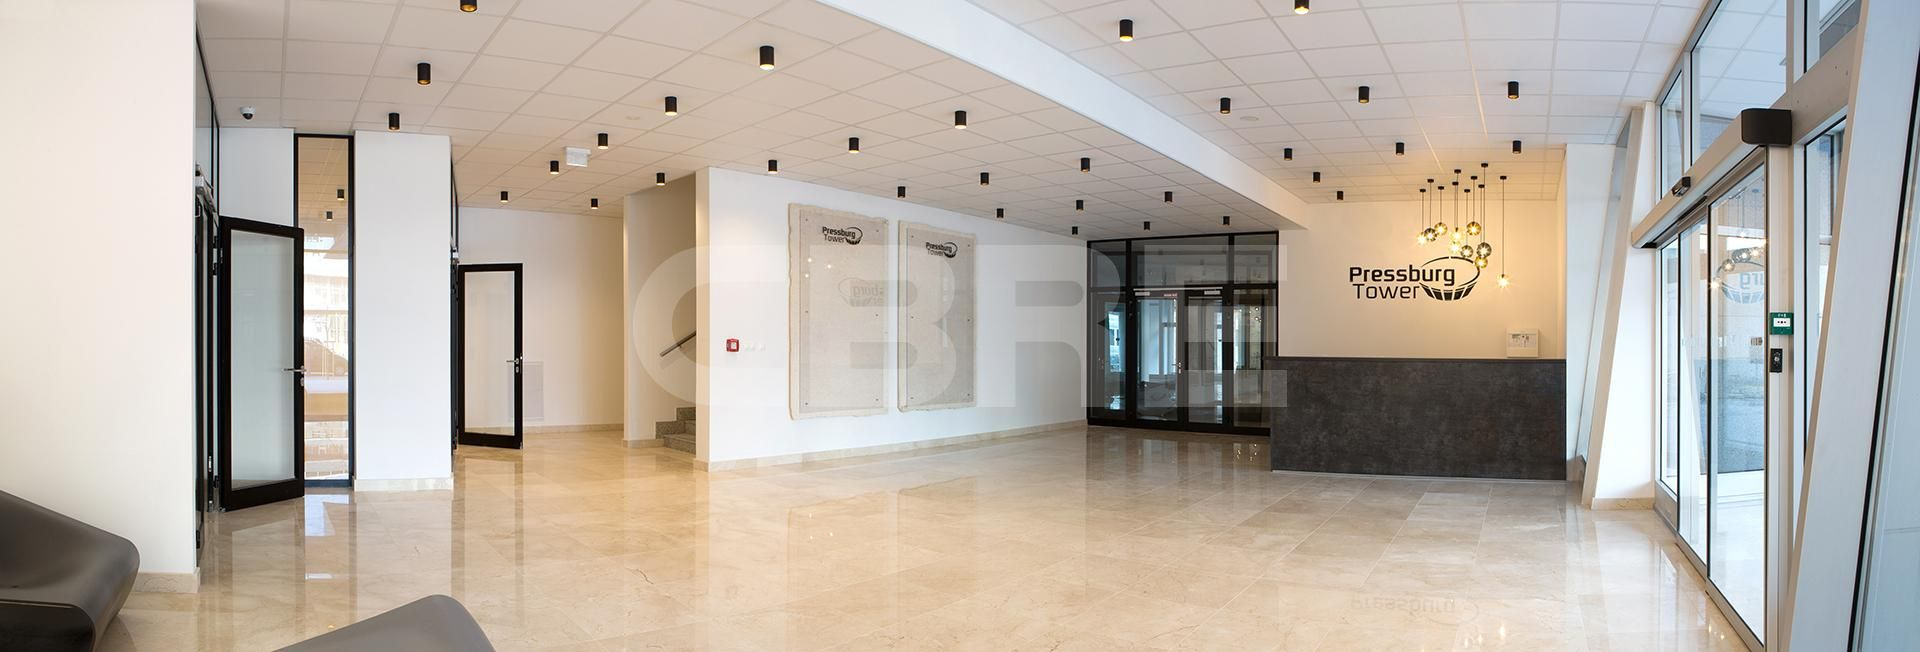 Pressburg Tower, Bratislava - Ružinov | Offices for rent by CBRE | 6